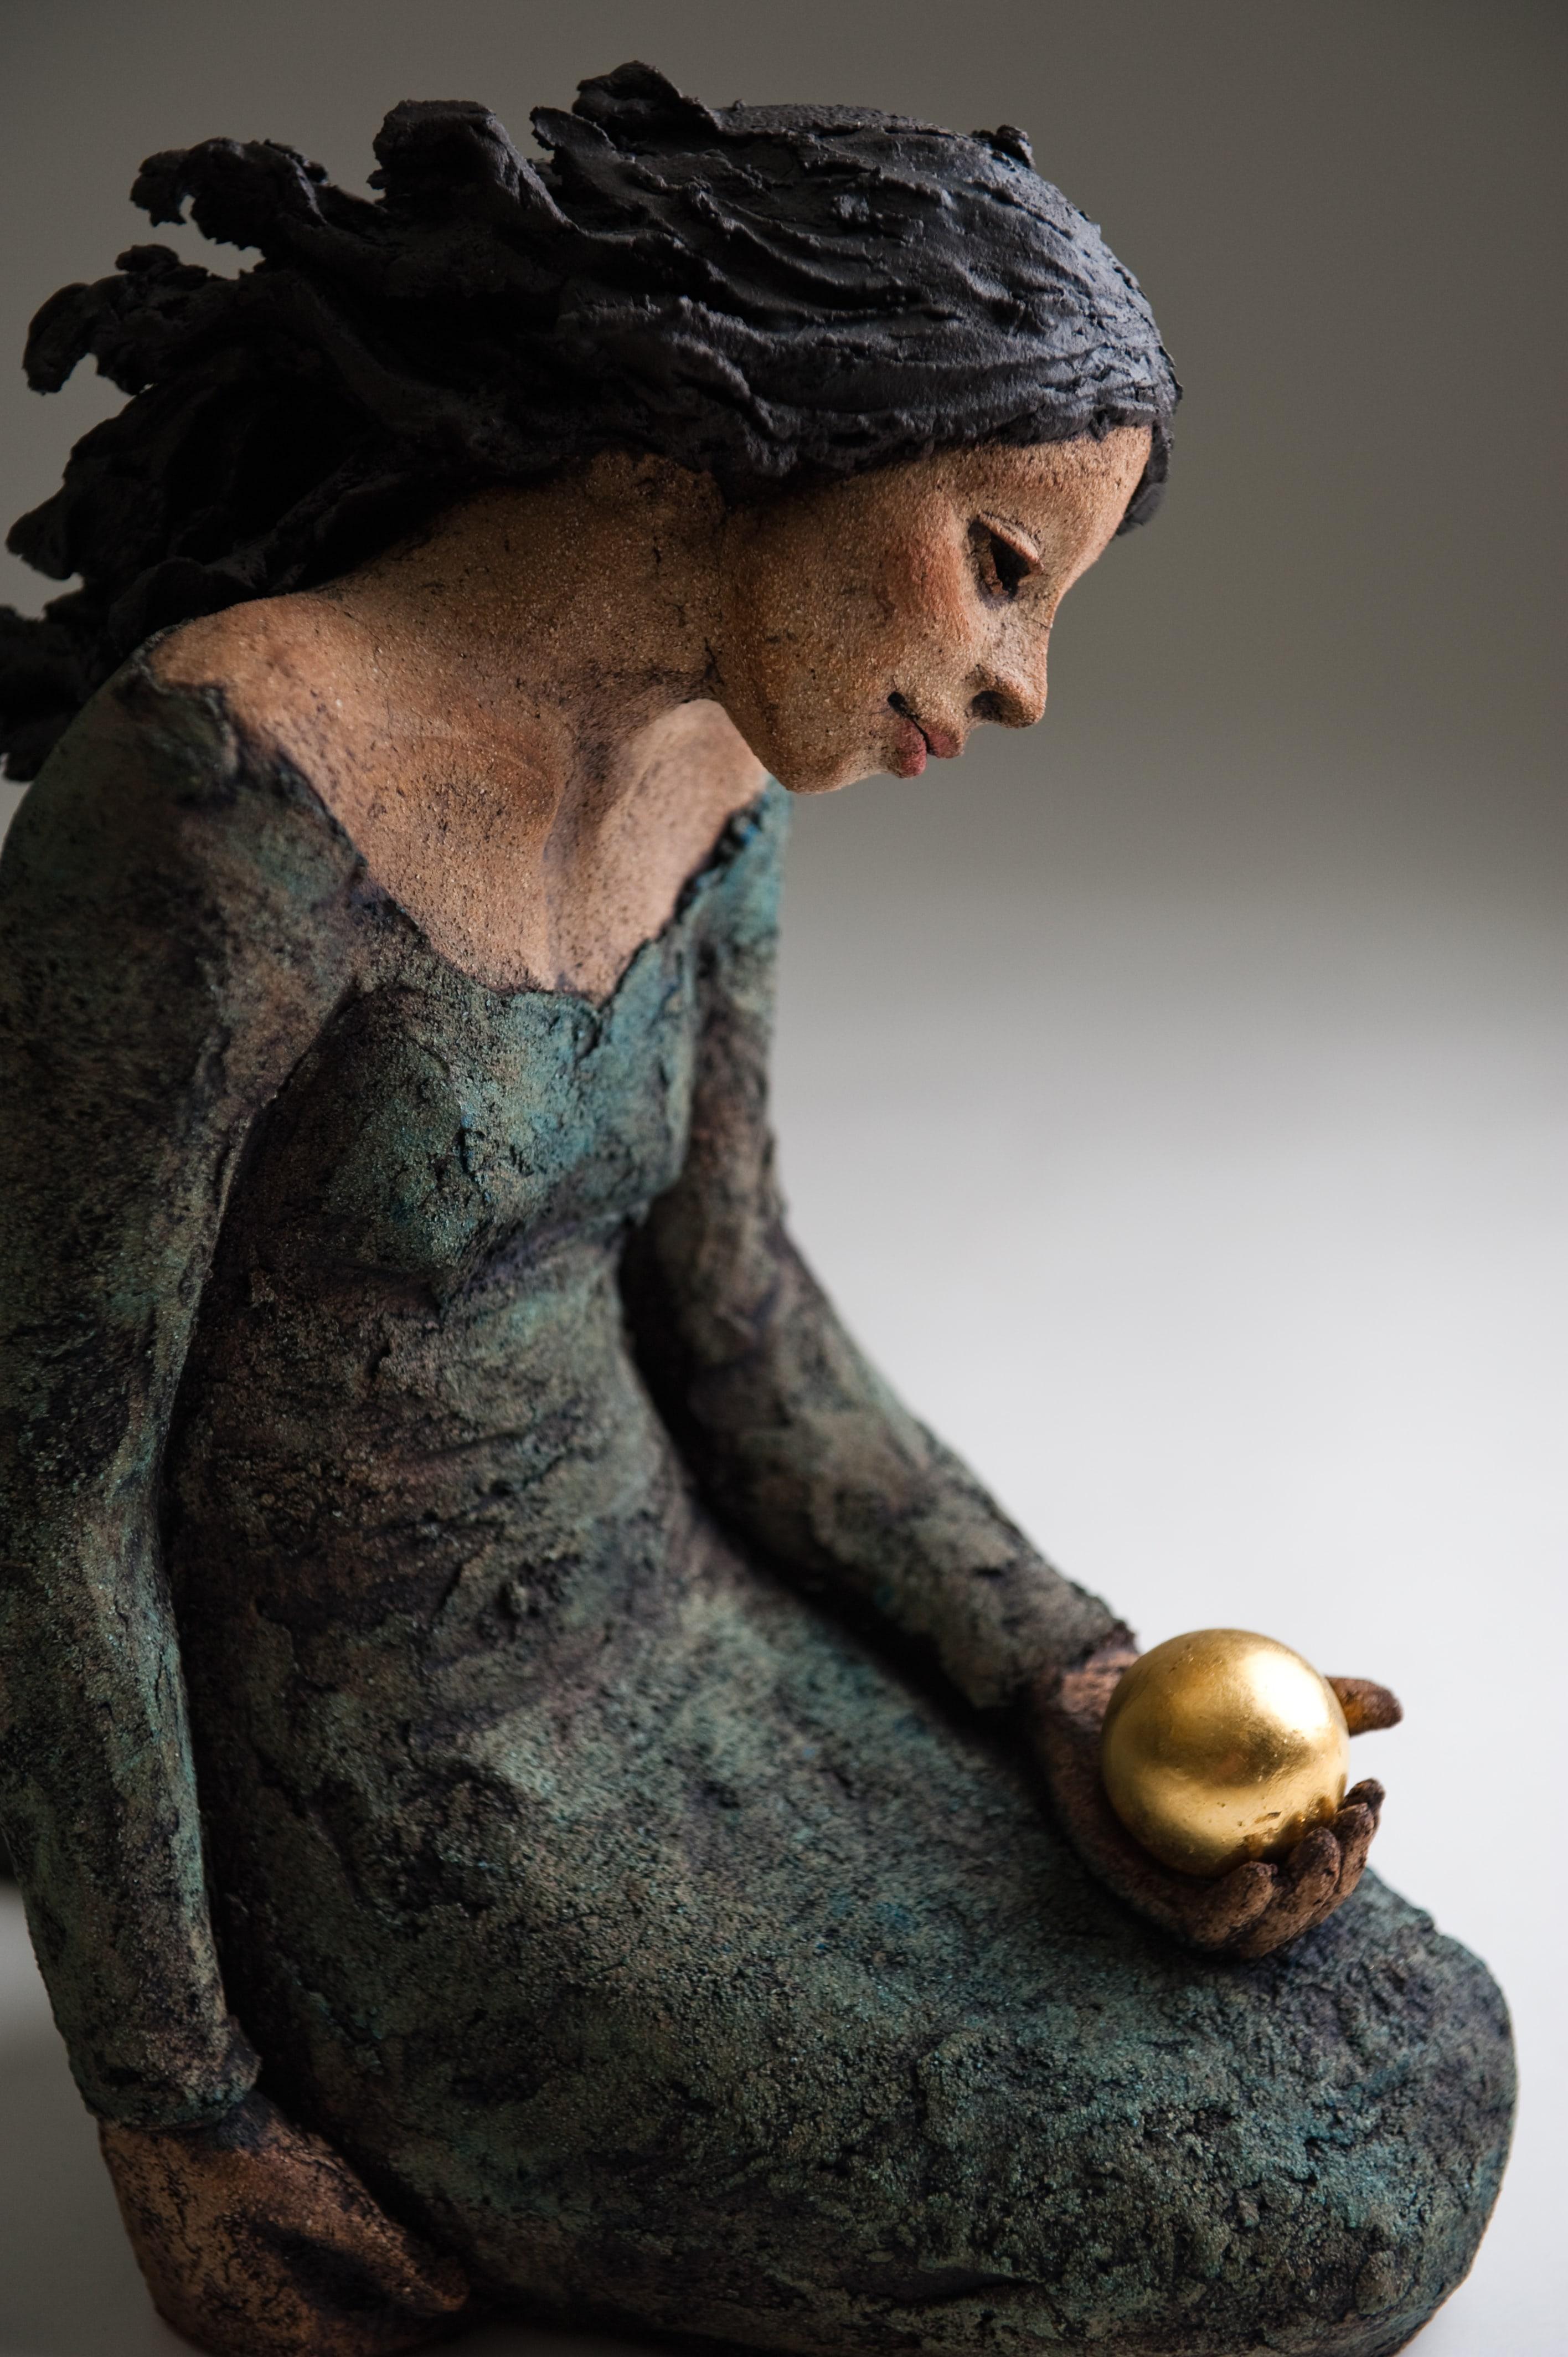 Gullperlen, keramikk, skulptur, Ingun Dahlin